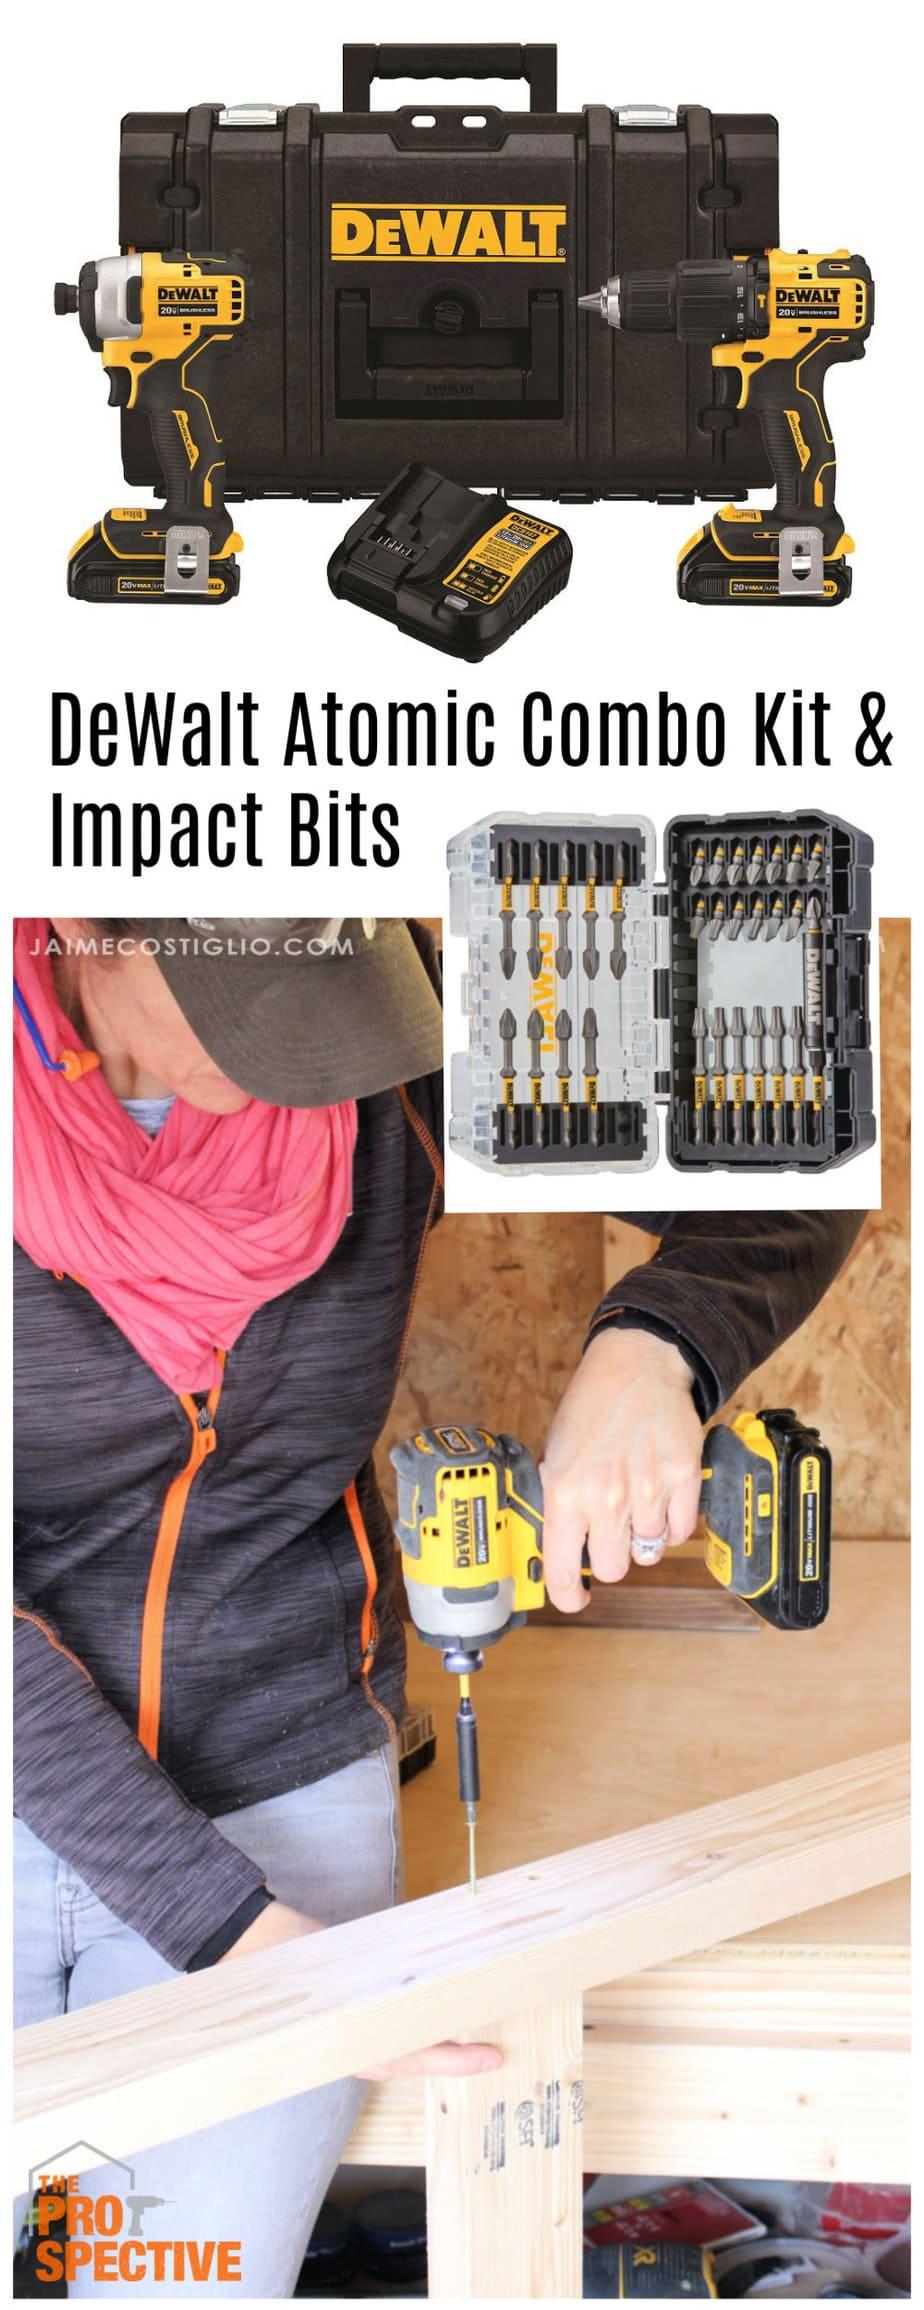 Dewalt Atomic combo set and impact bits